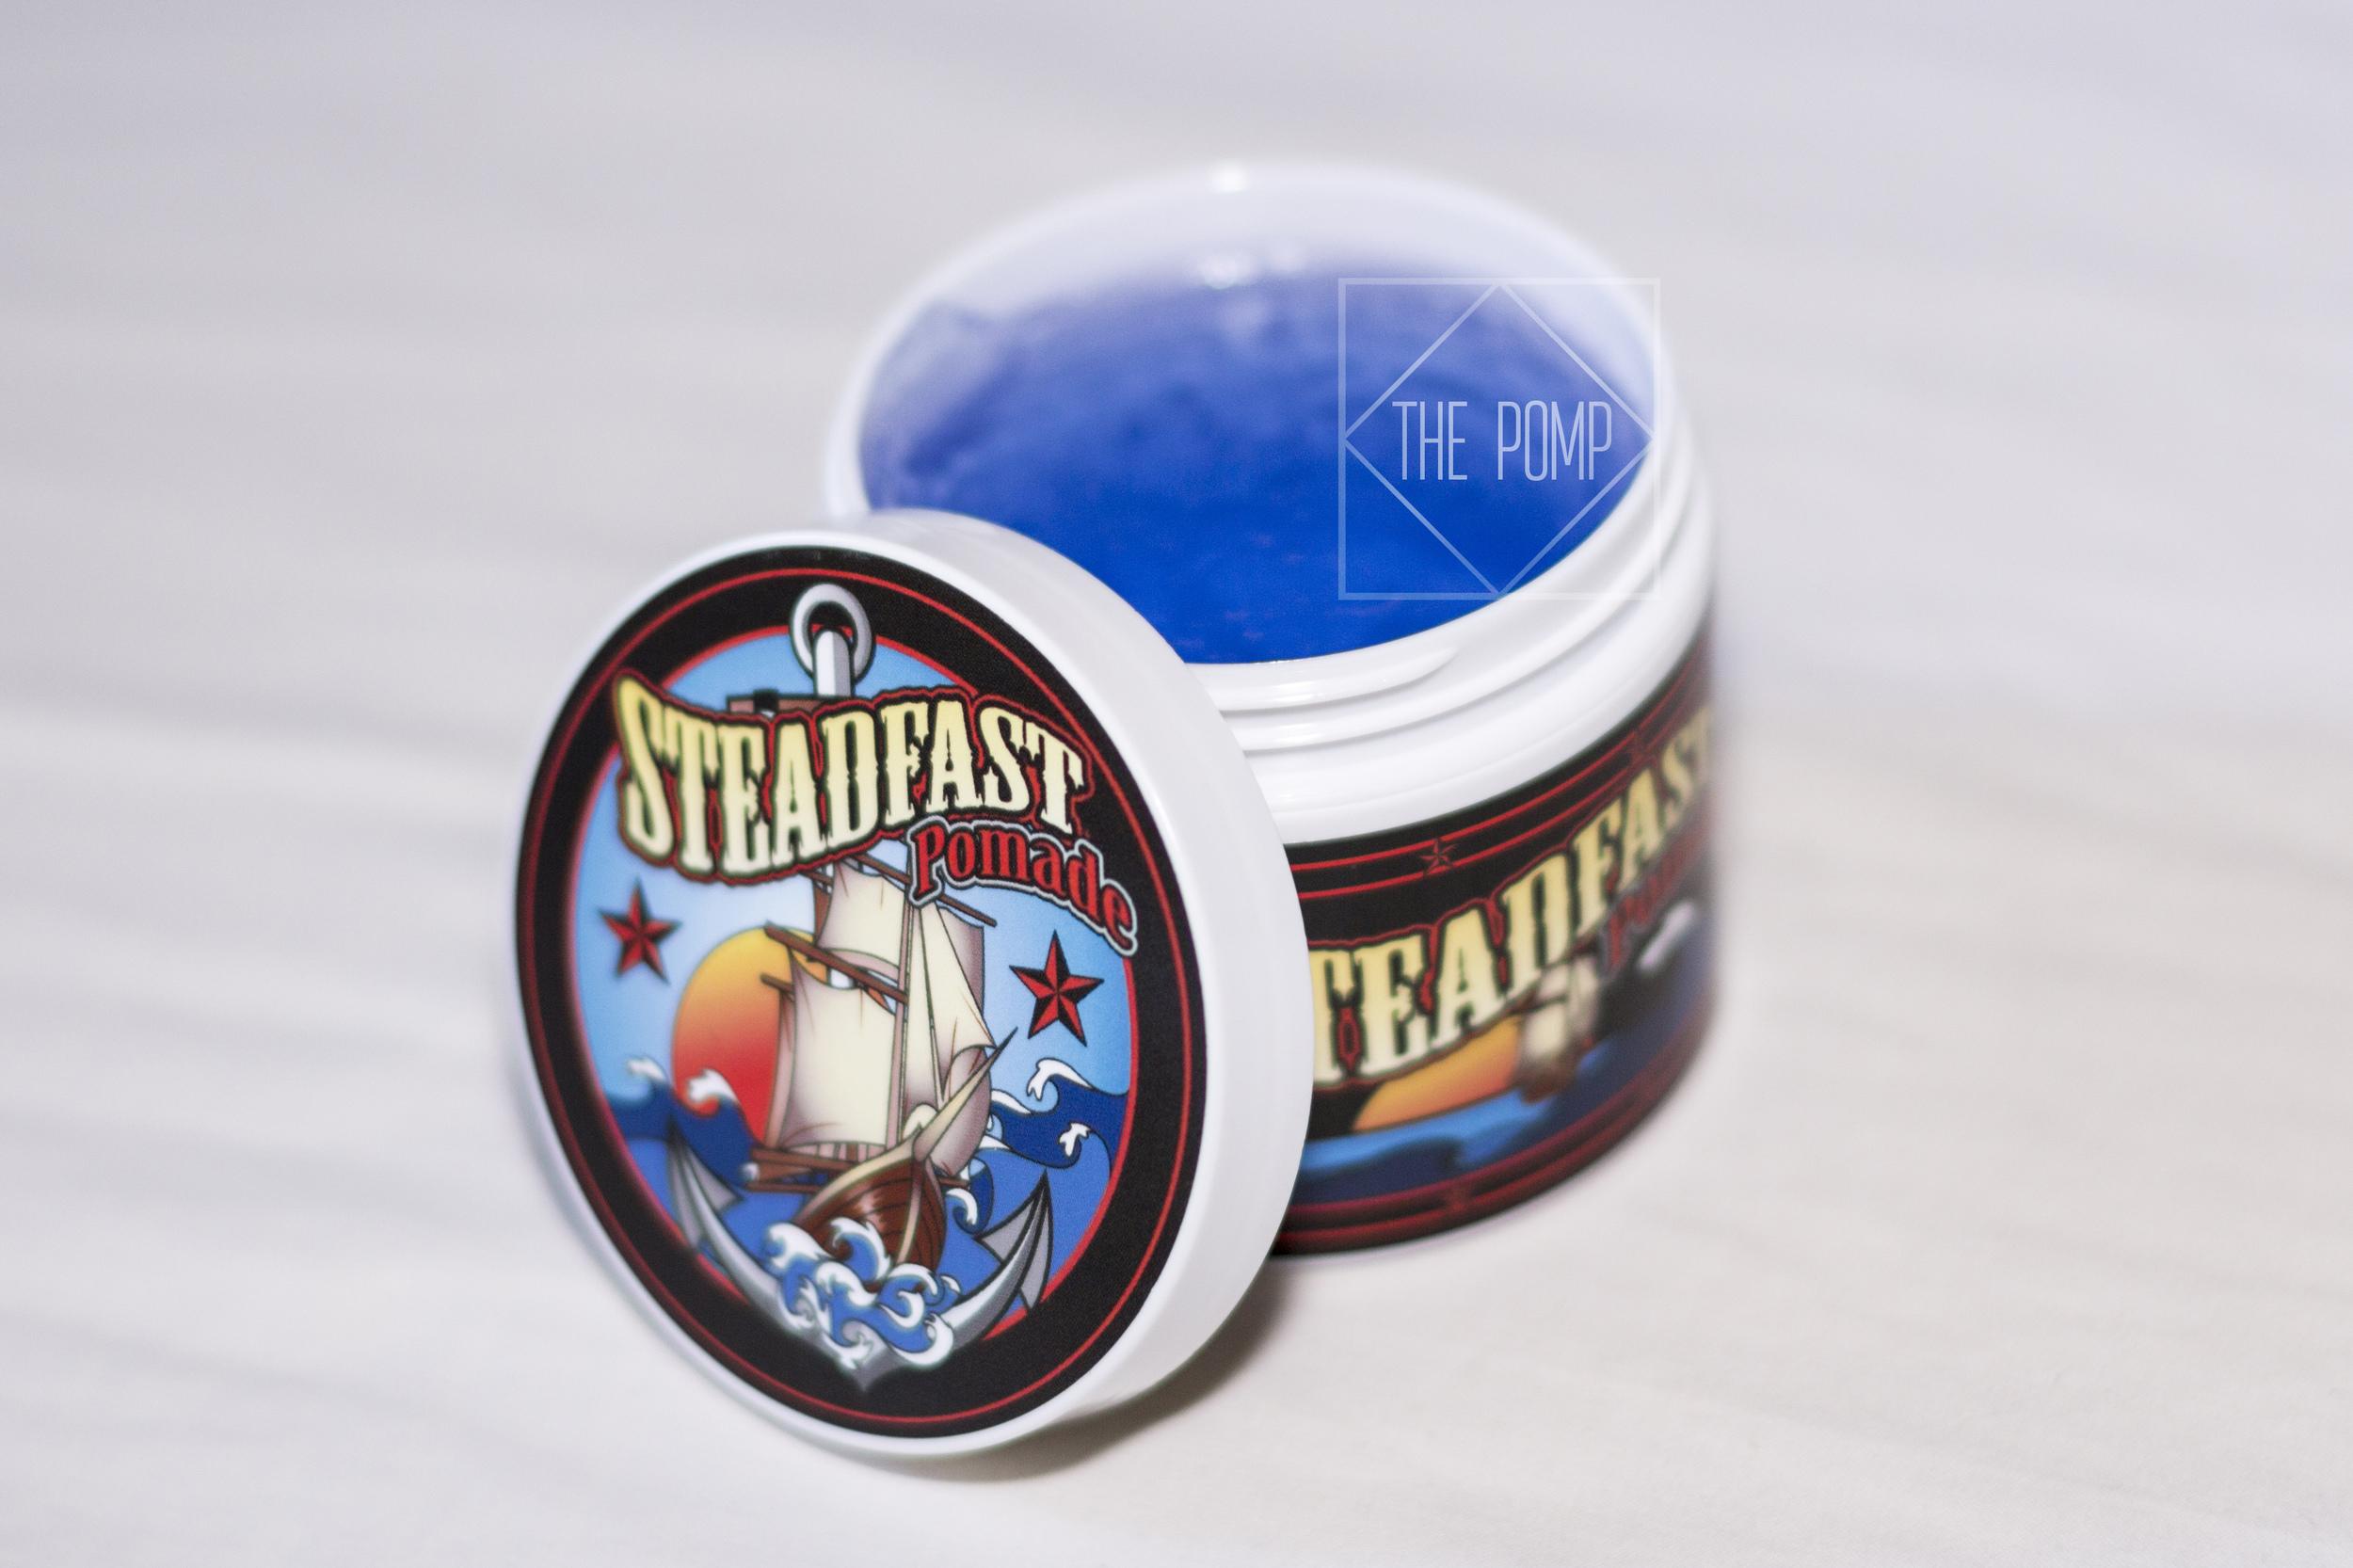 Steadfast Pomade texture